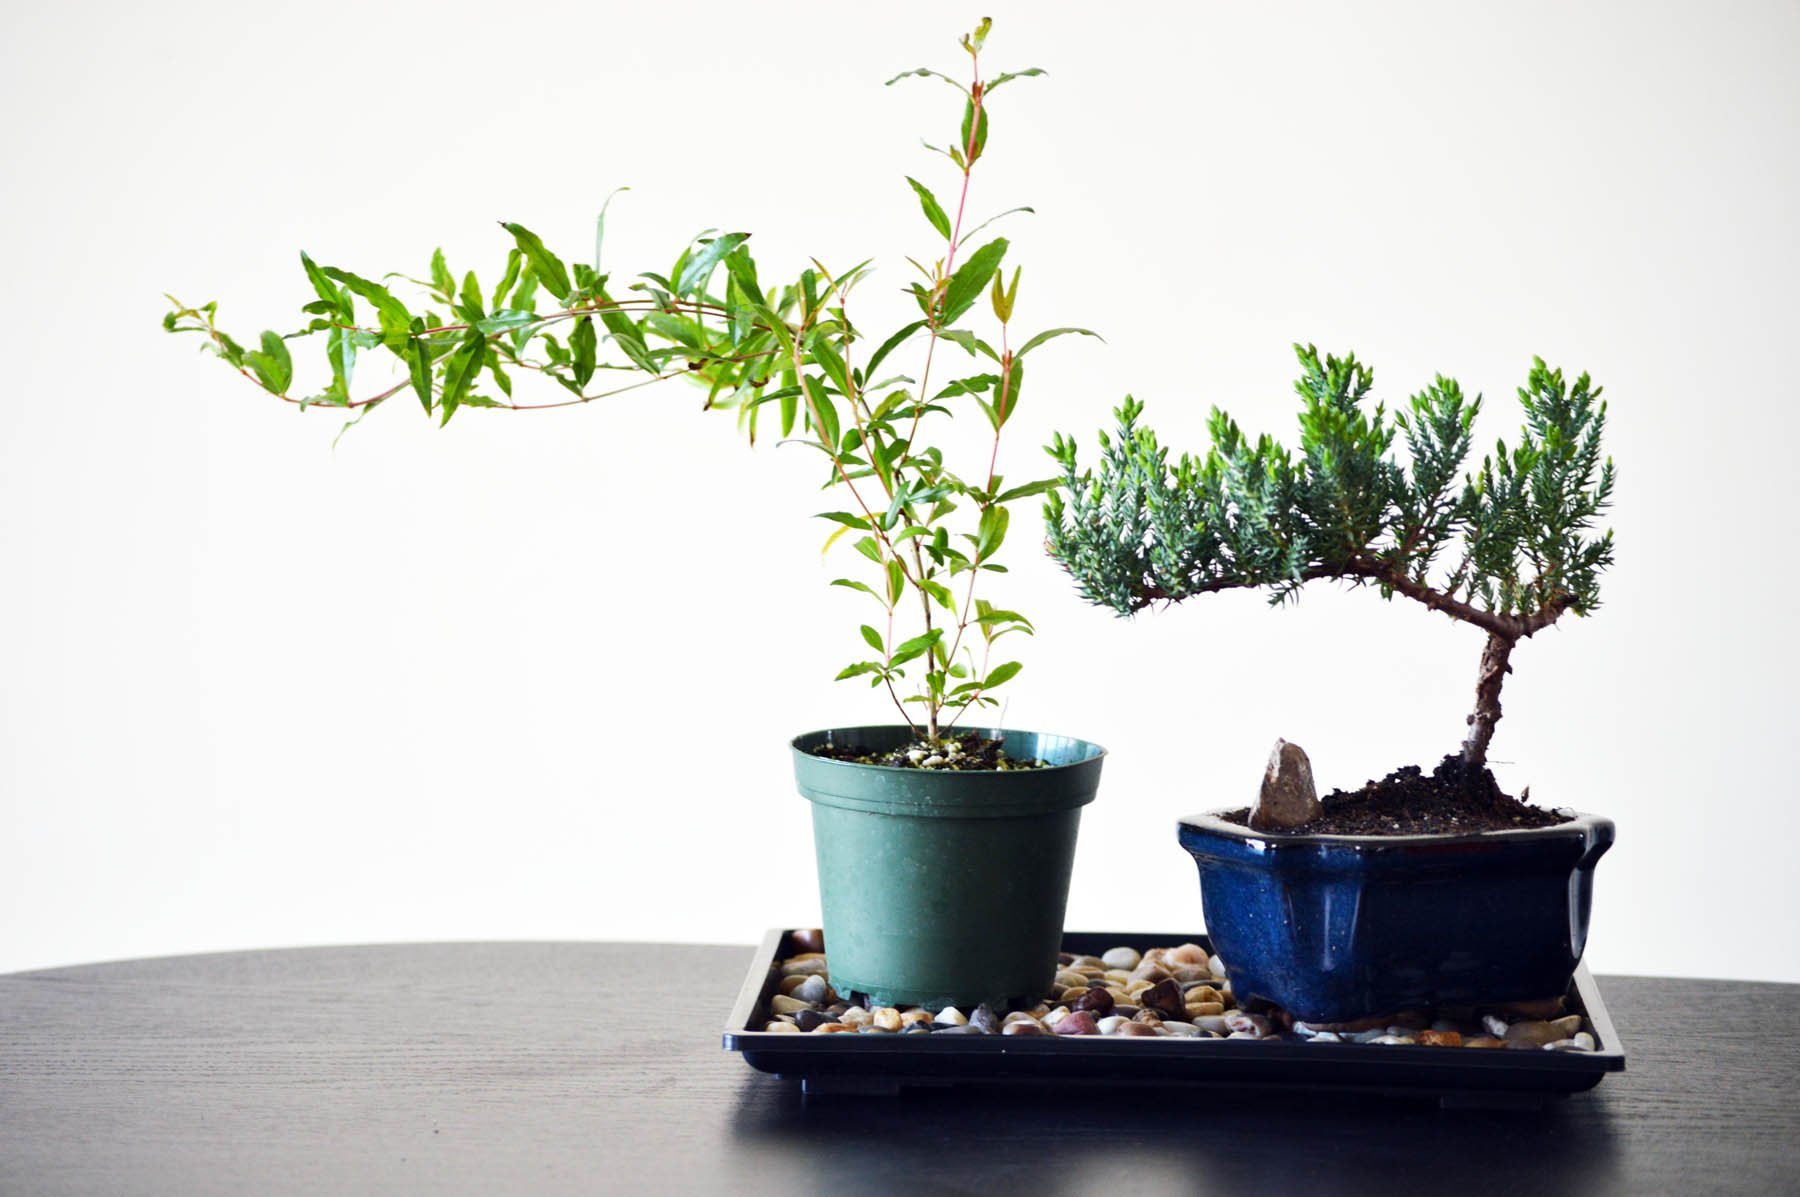 9GreenBox Bonsai Humidity Drip Tray with Pebbles Rocks, 8-Inch x 10-Inch